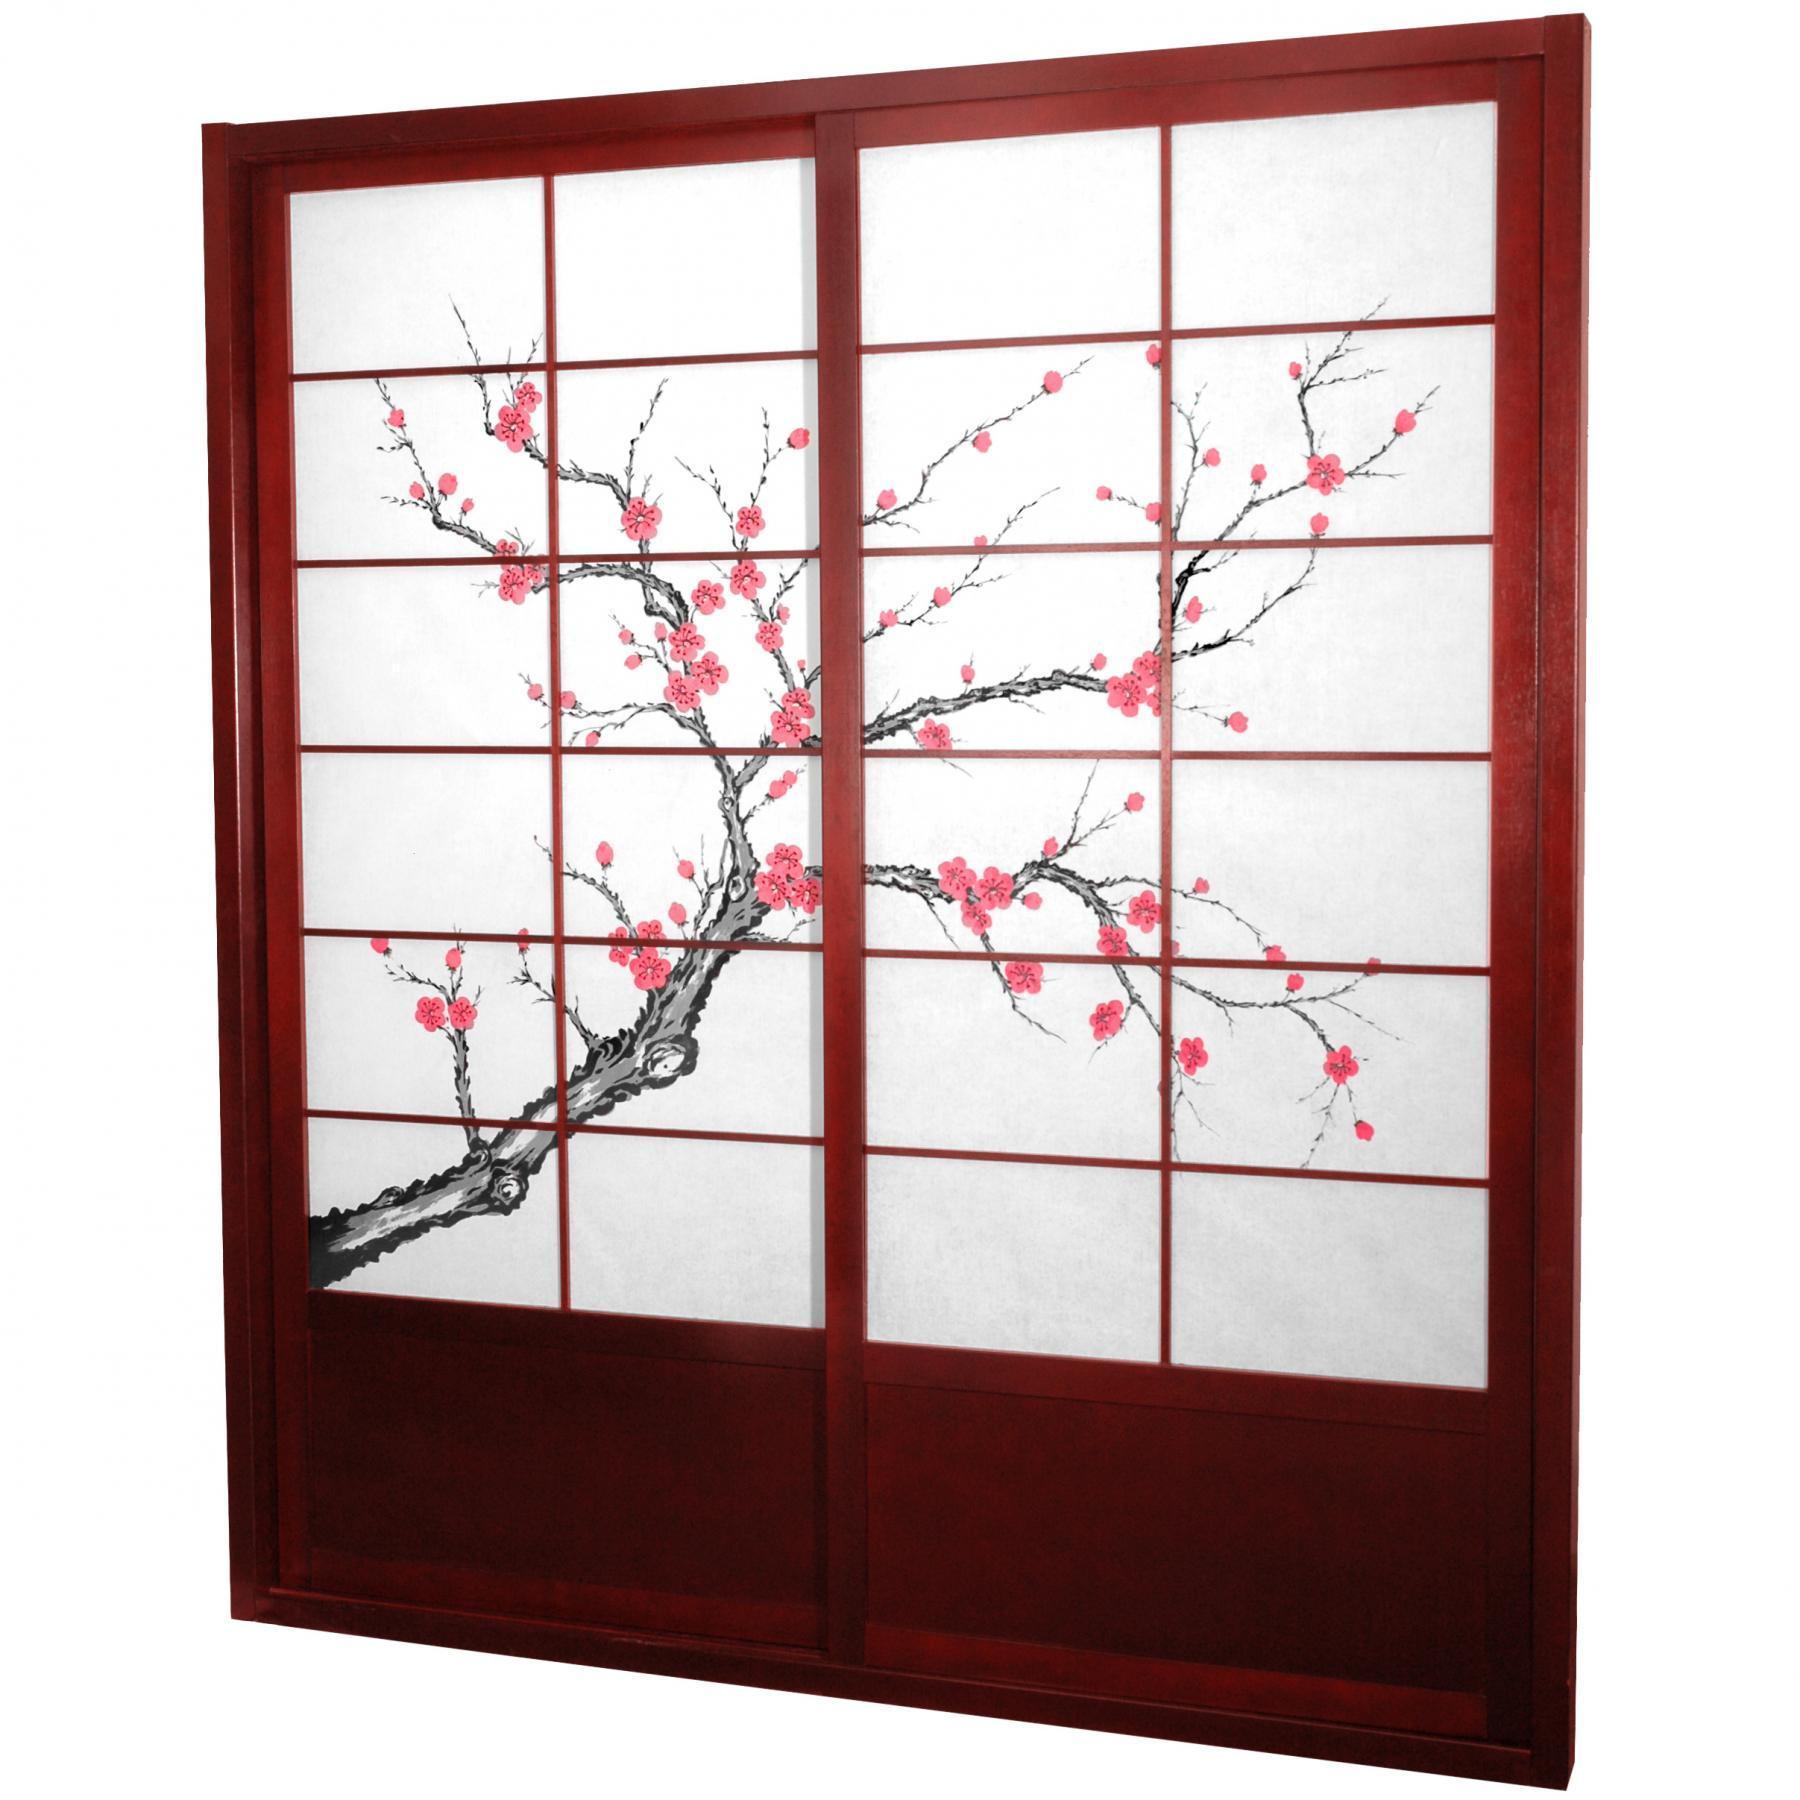 7 Ft Tall Cherry Blossom Shoji Sliding Door Kit